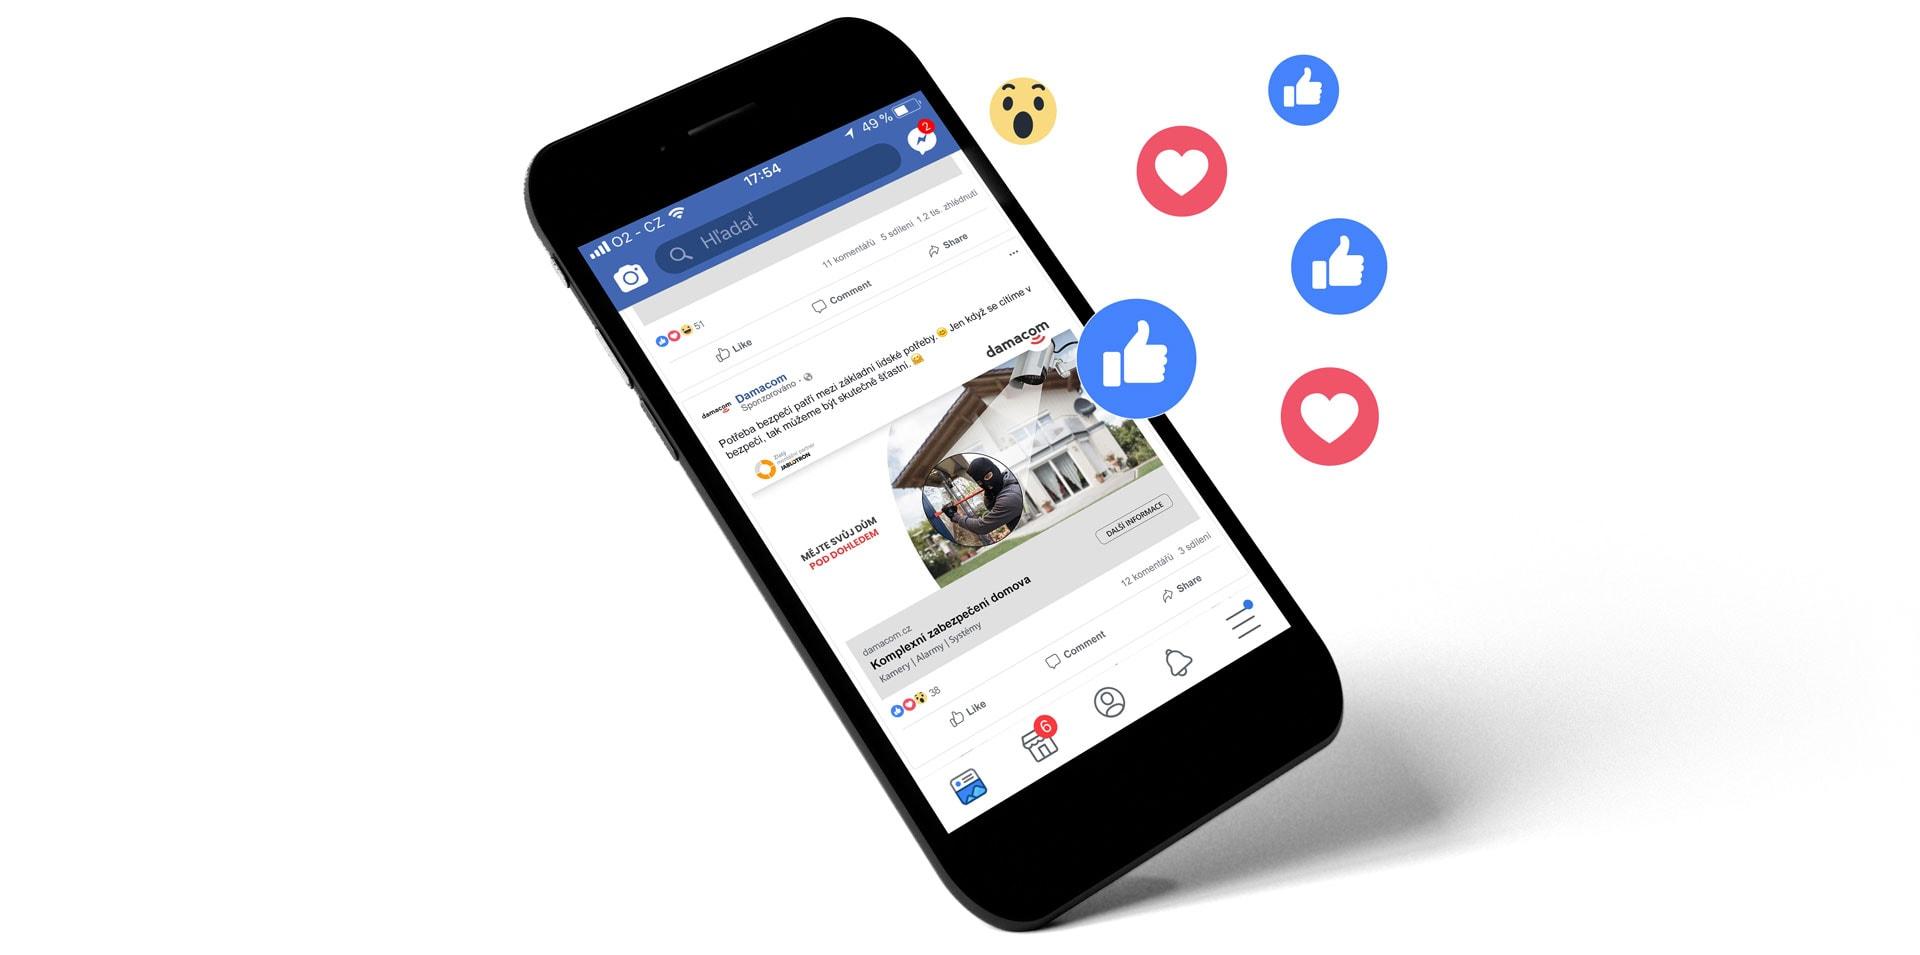 Tvorba facebook kampaní